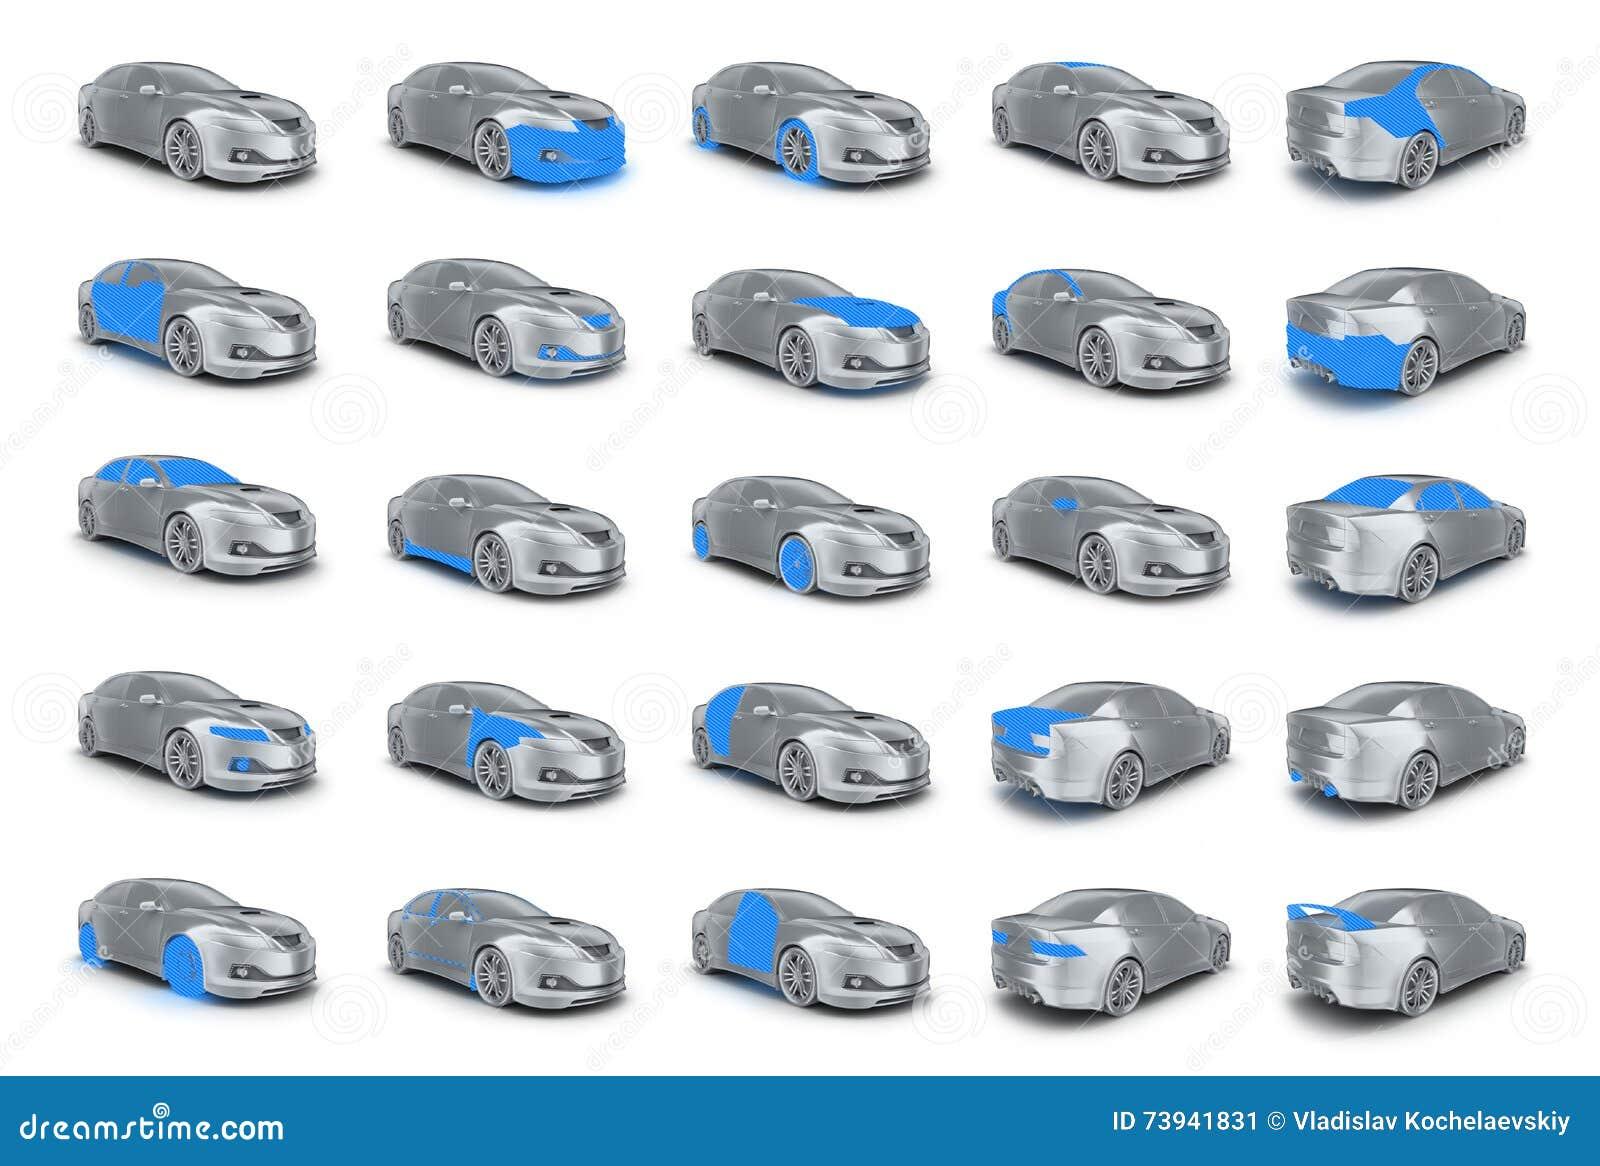 Car body parts stock illustration. Illustration of vehicle - 73941831